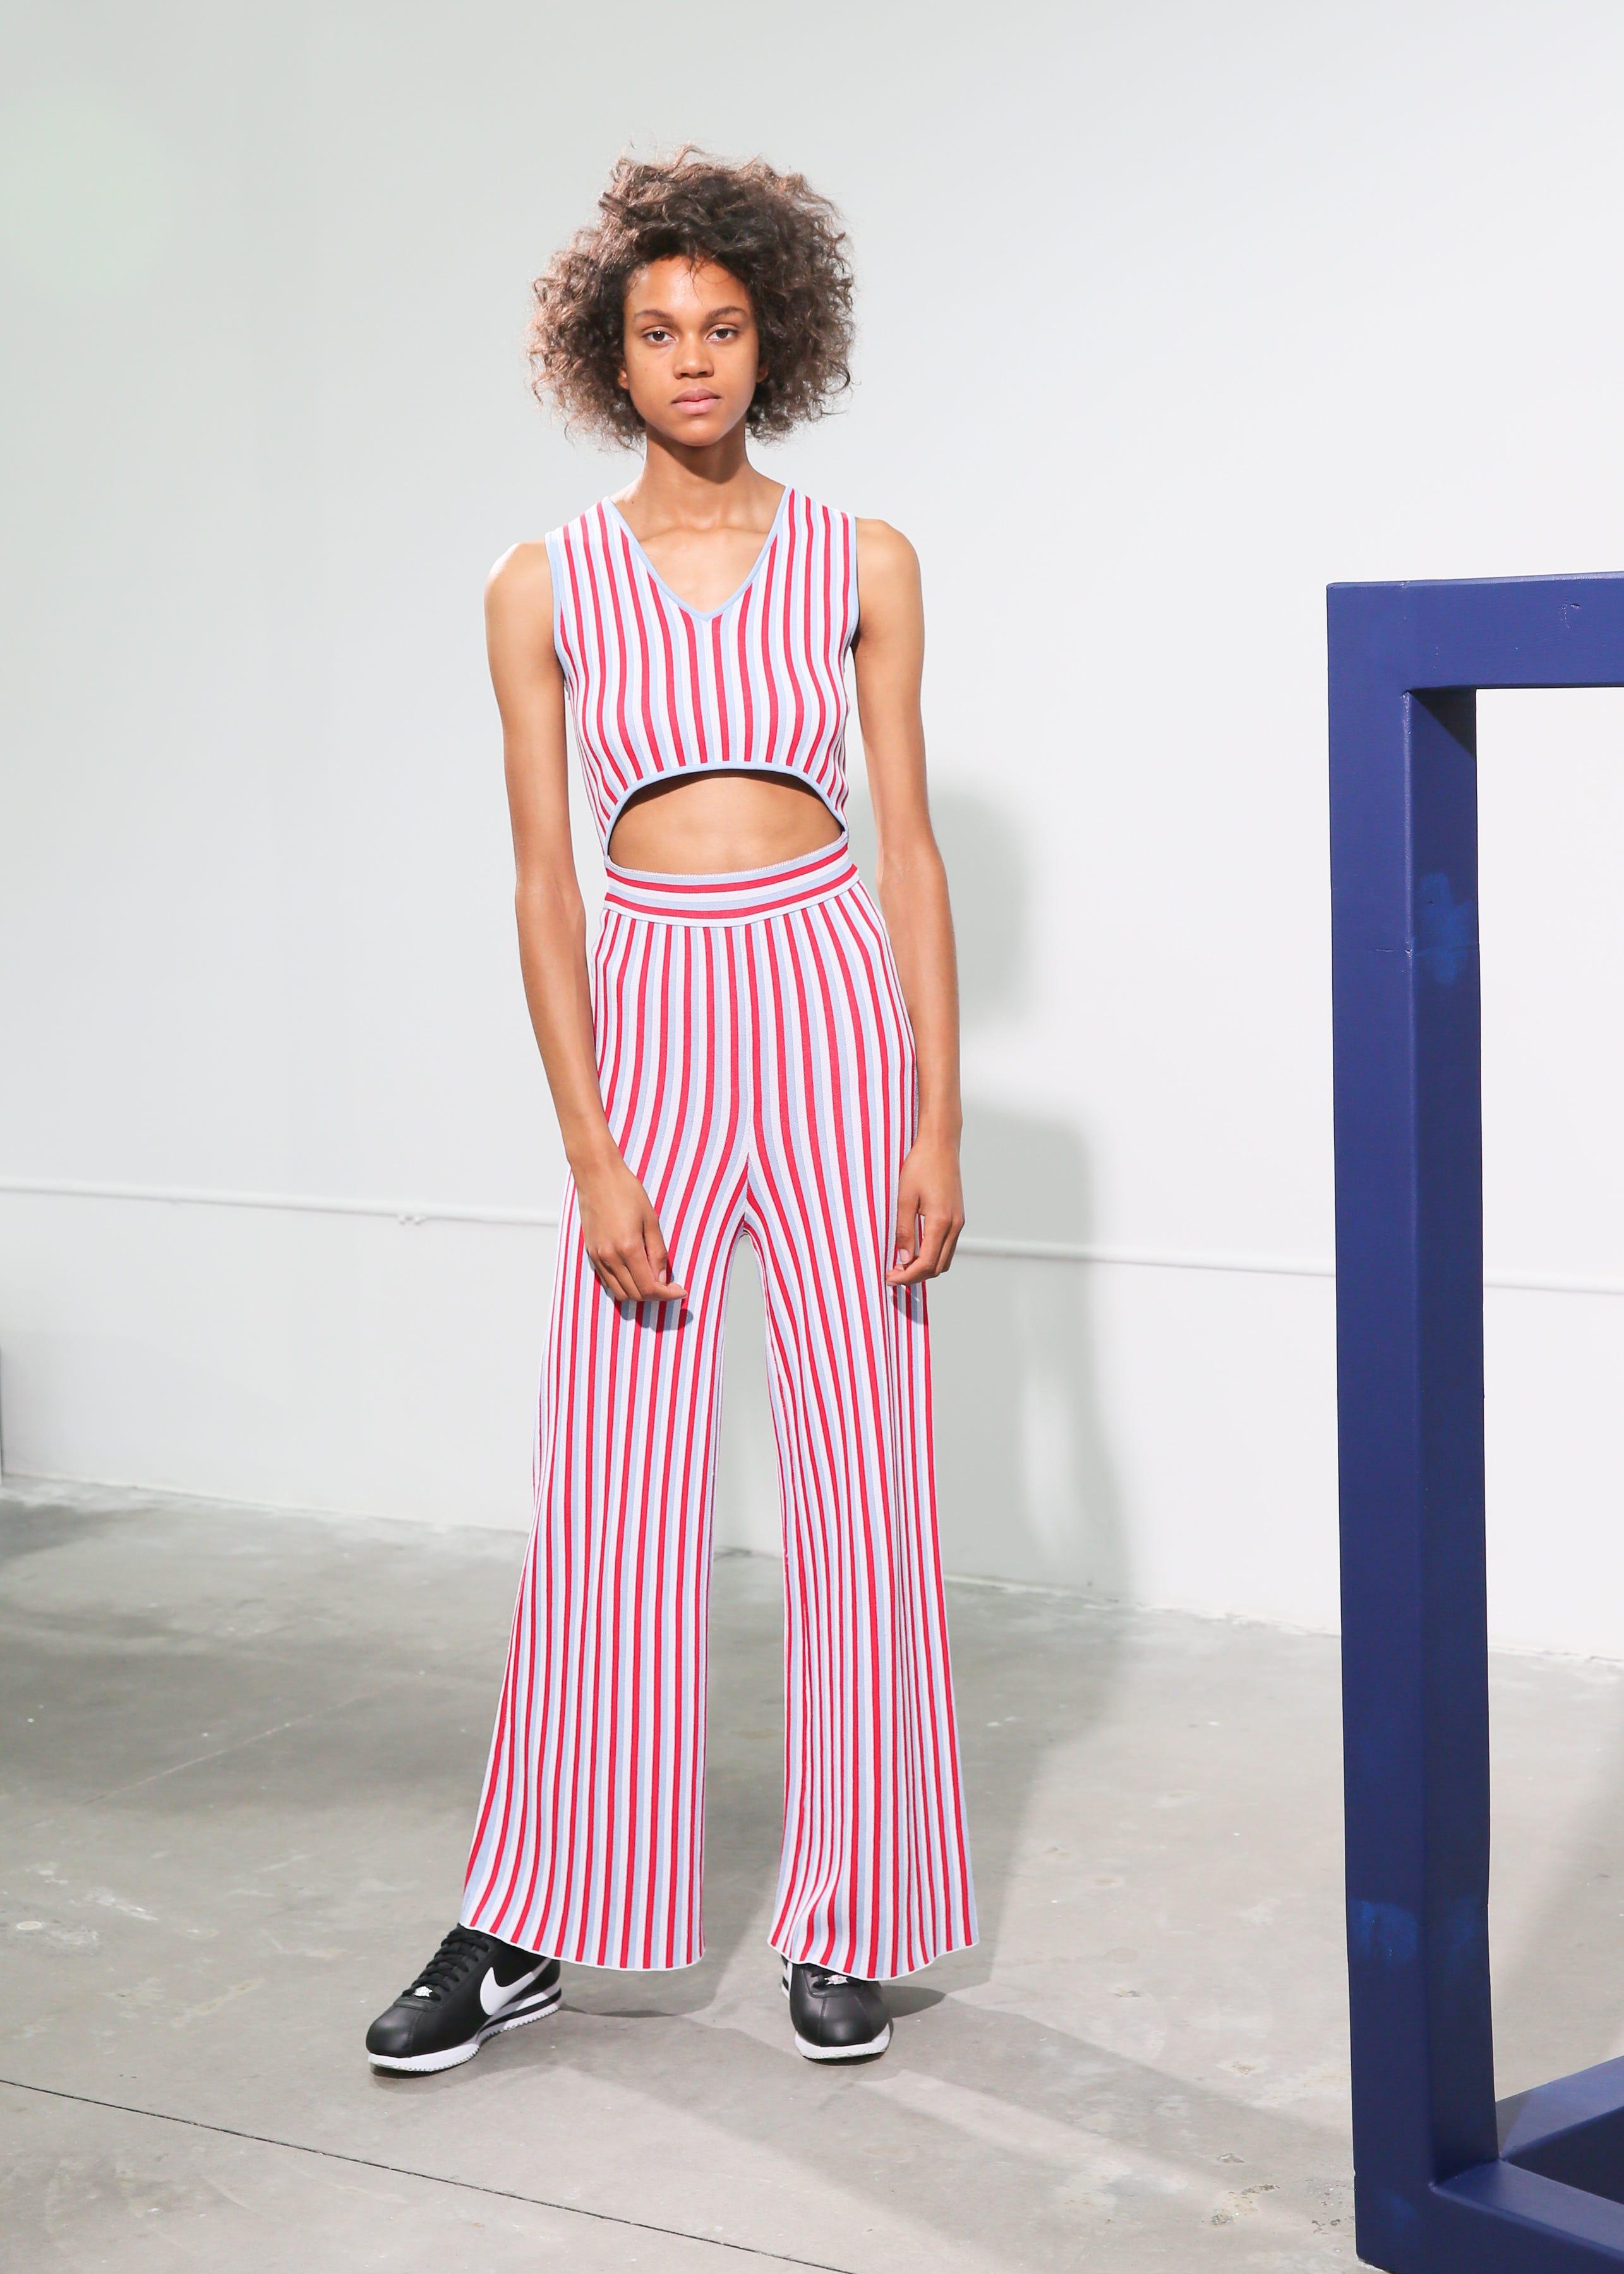 Top PR Firms NYC Boutique Fashion PR Agency AMP3 35